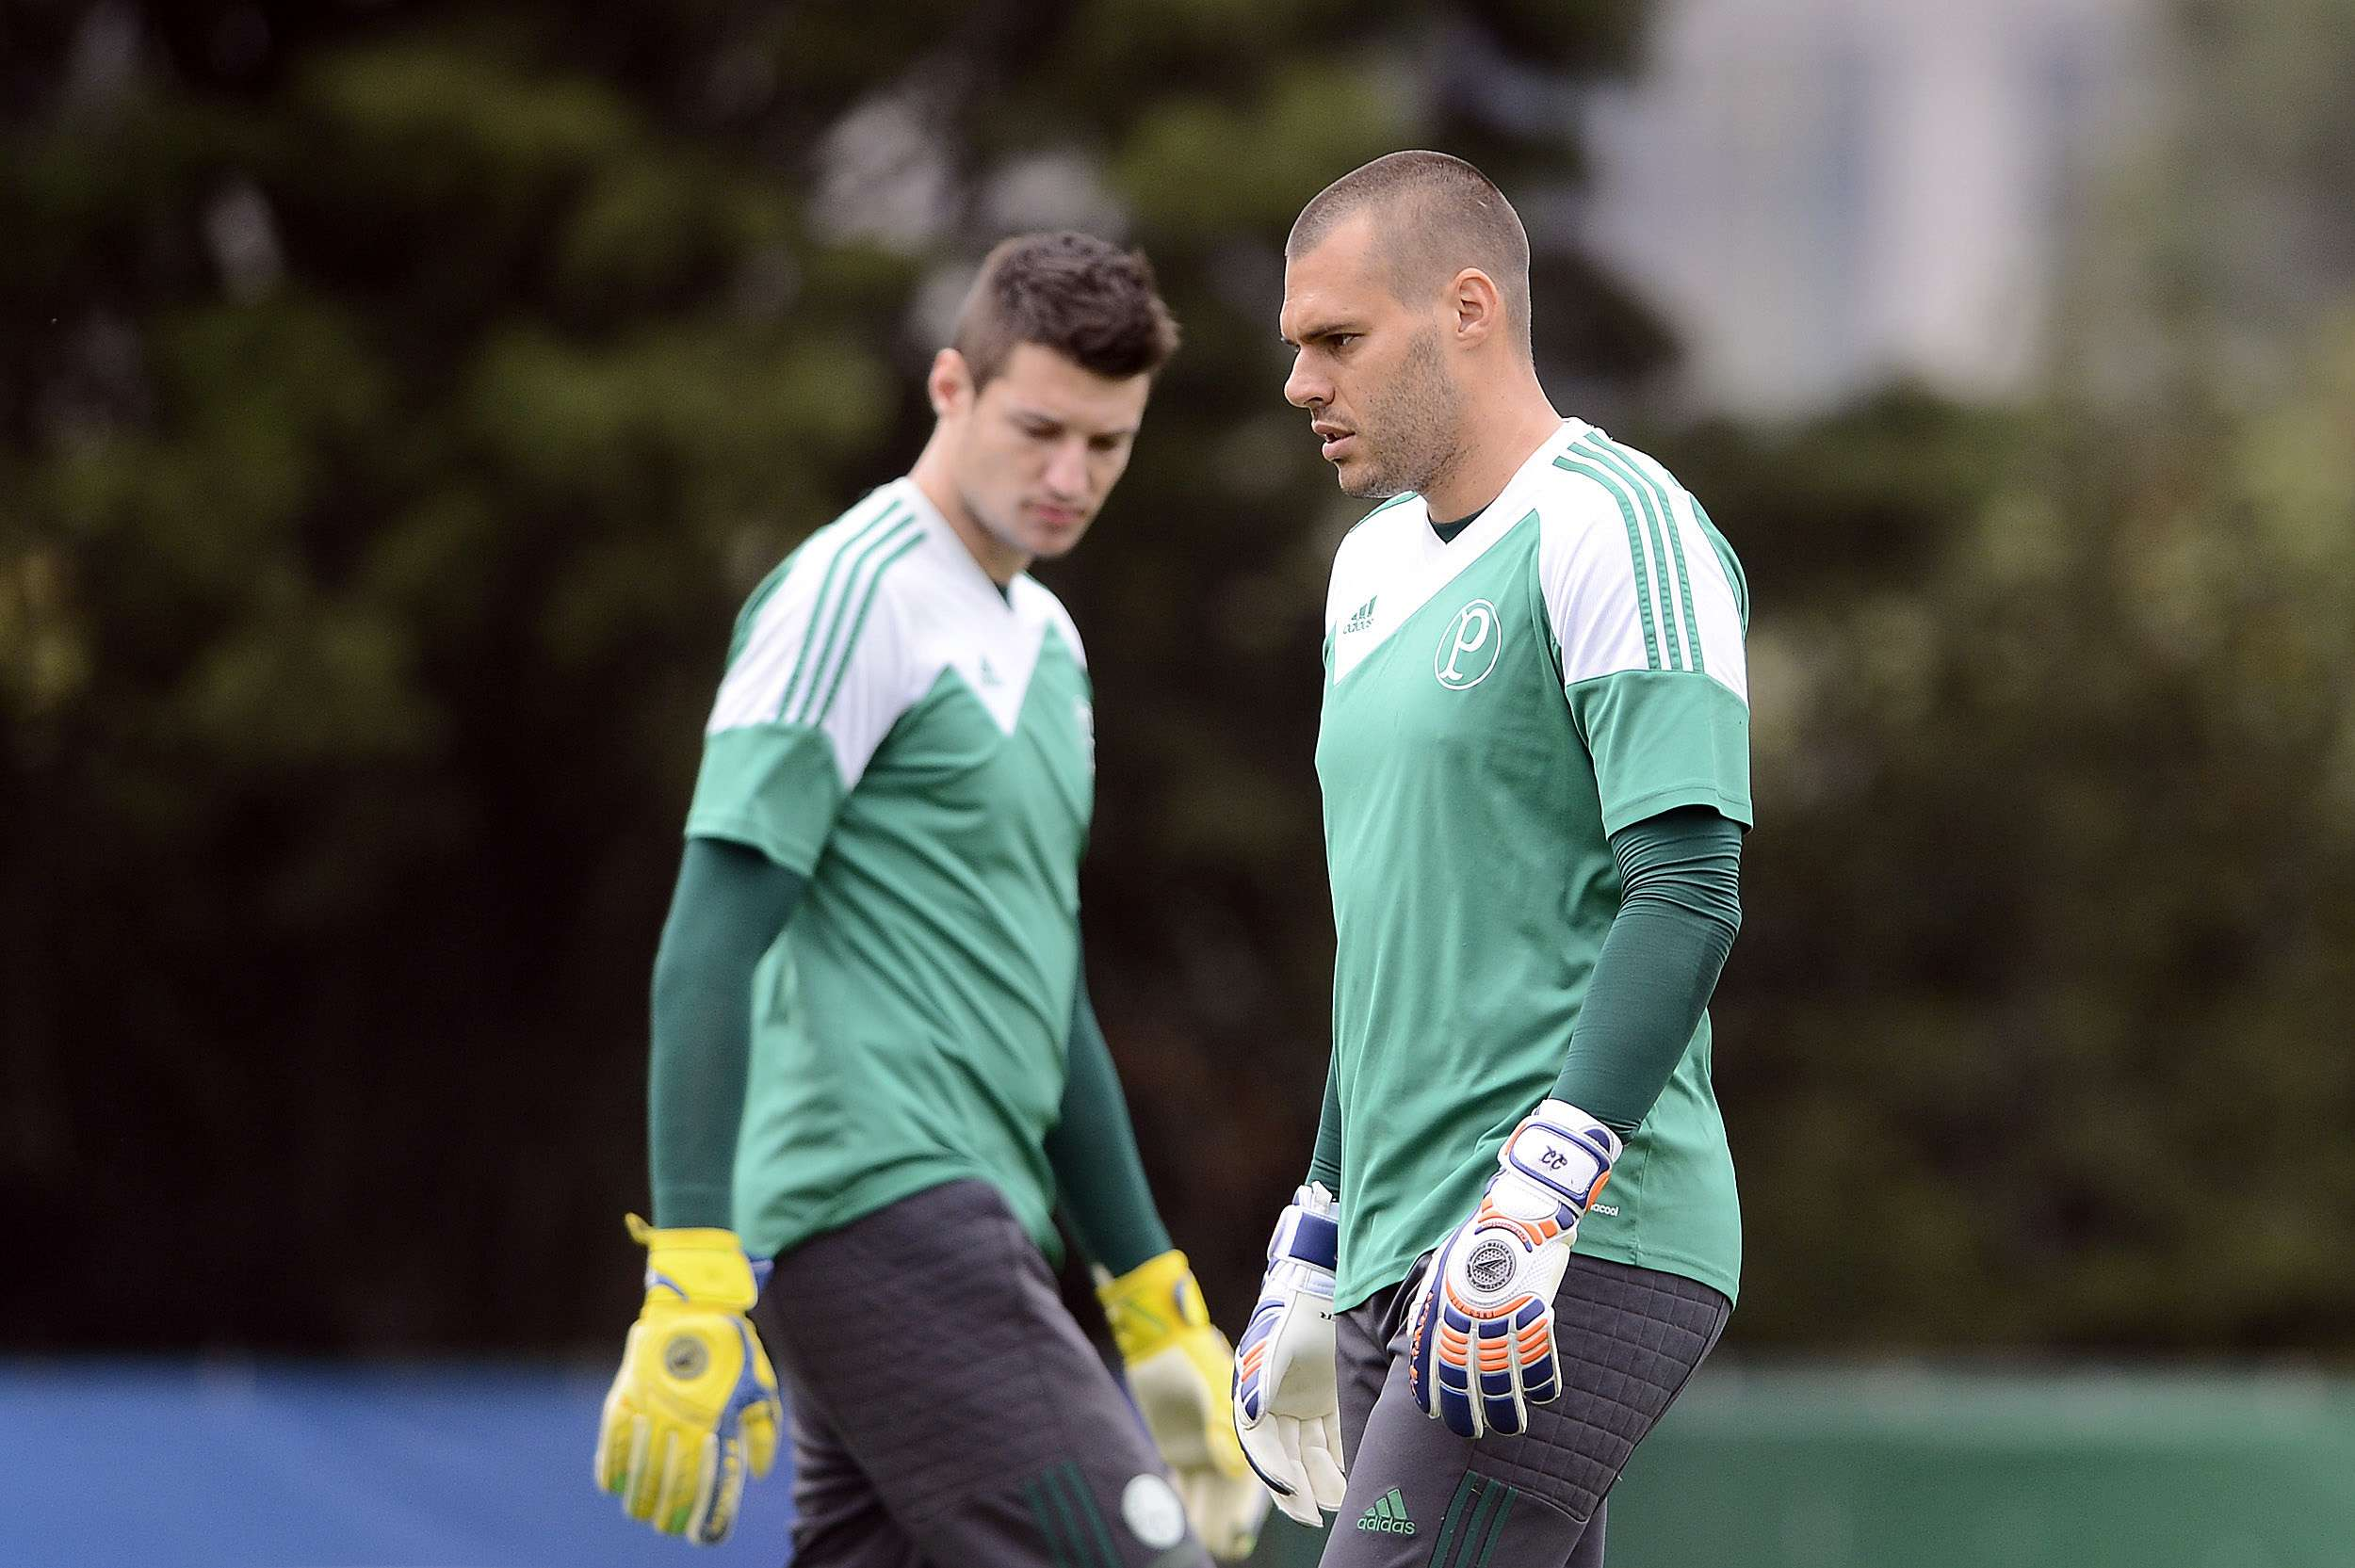 Deola vai ter nova chance na equipe do Palmeiras Foto: Mauro Horita/Agif/Gazeta Press